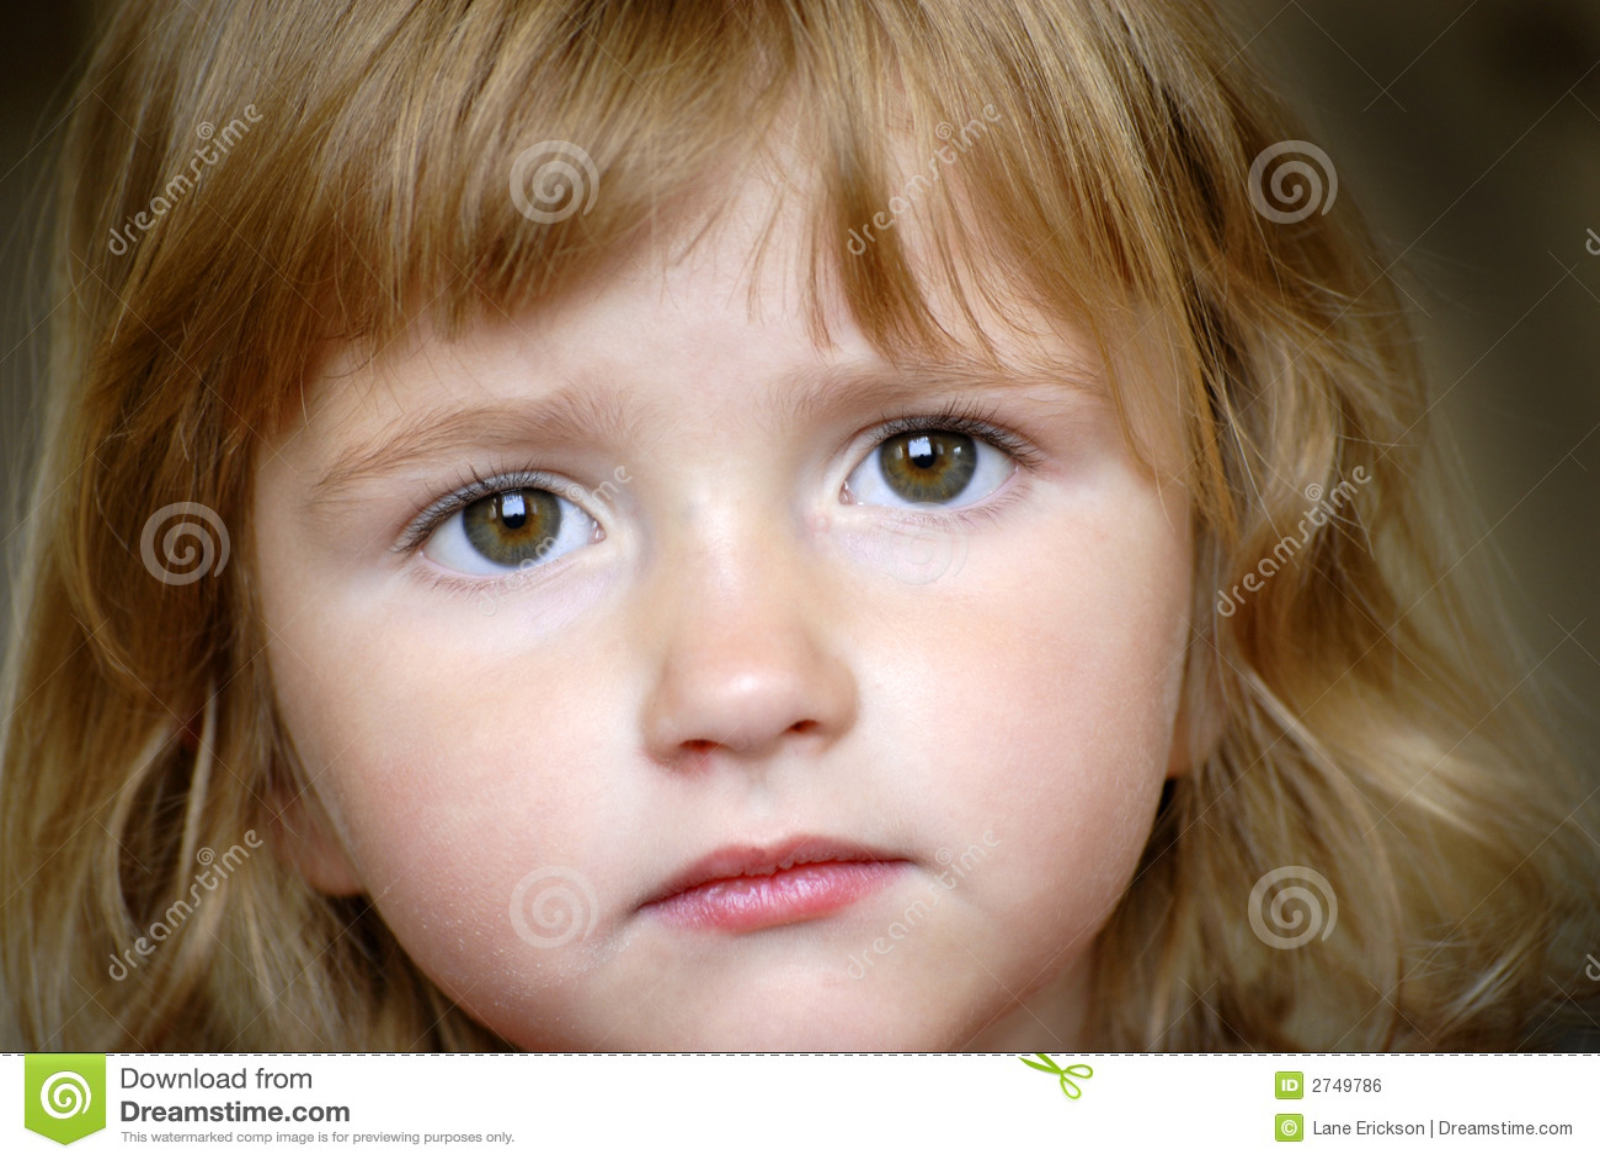 77c1b8626bb Little Girl Portrait stock photo. Image of innocent